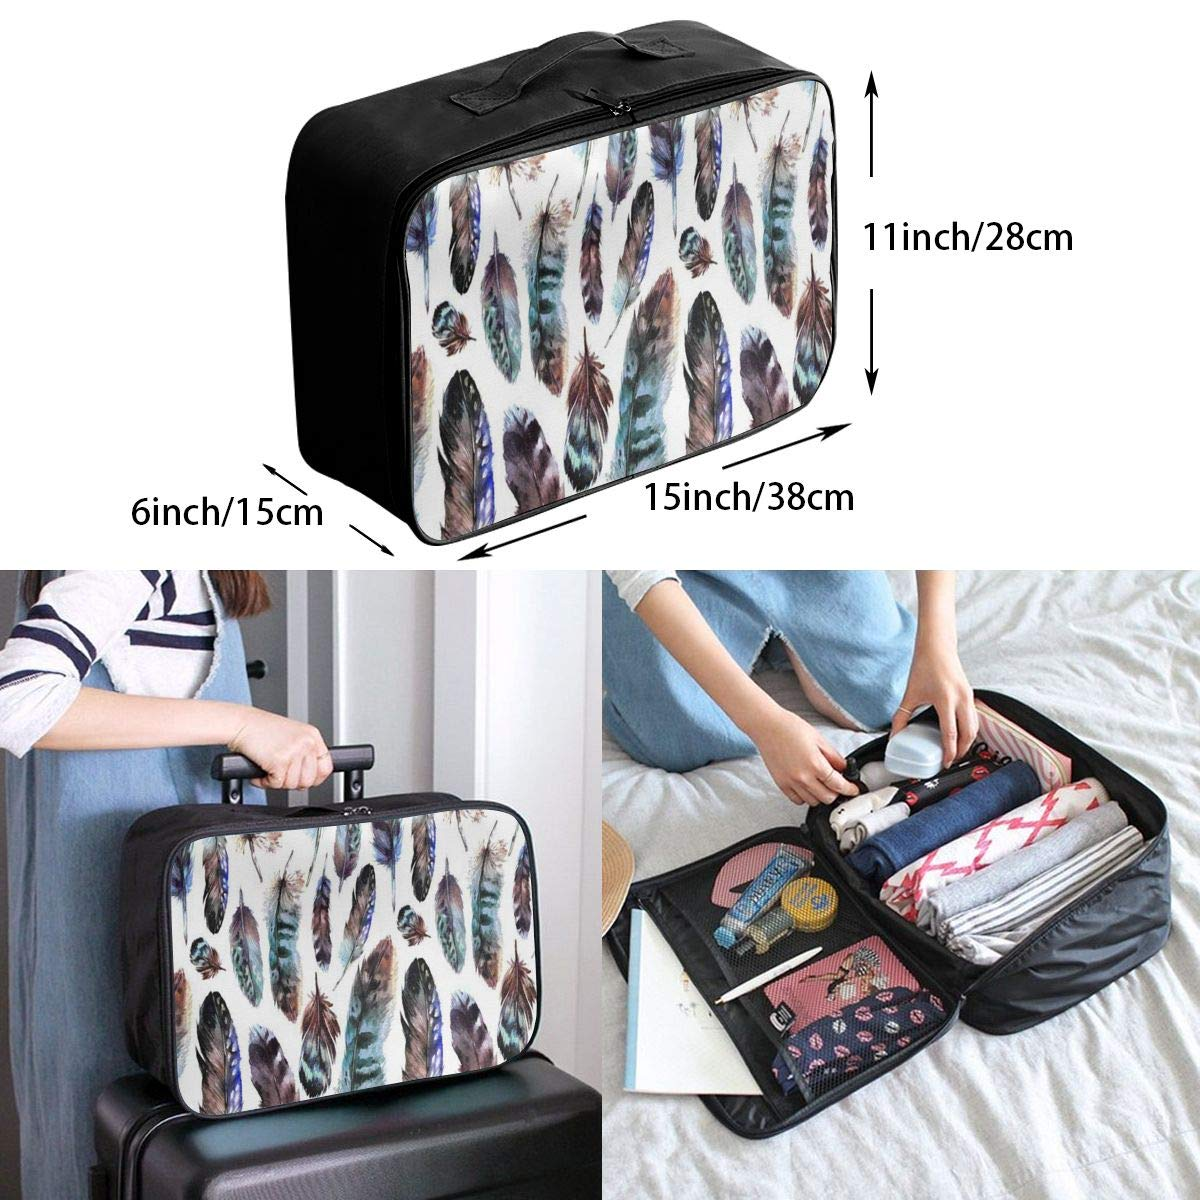 Travel Bags Watercolor Easter Bunny Rabbit Art Portable Handbag Trolley Handle Luggage Bag